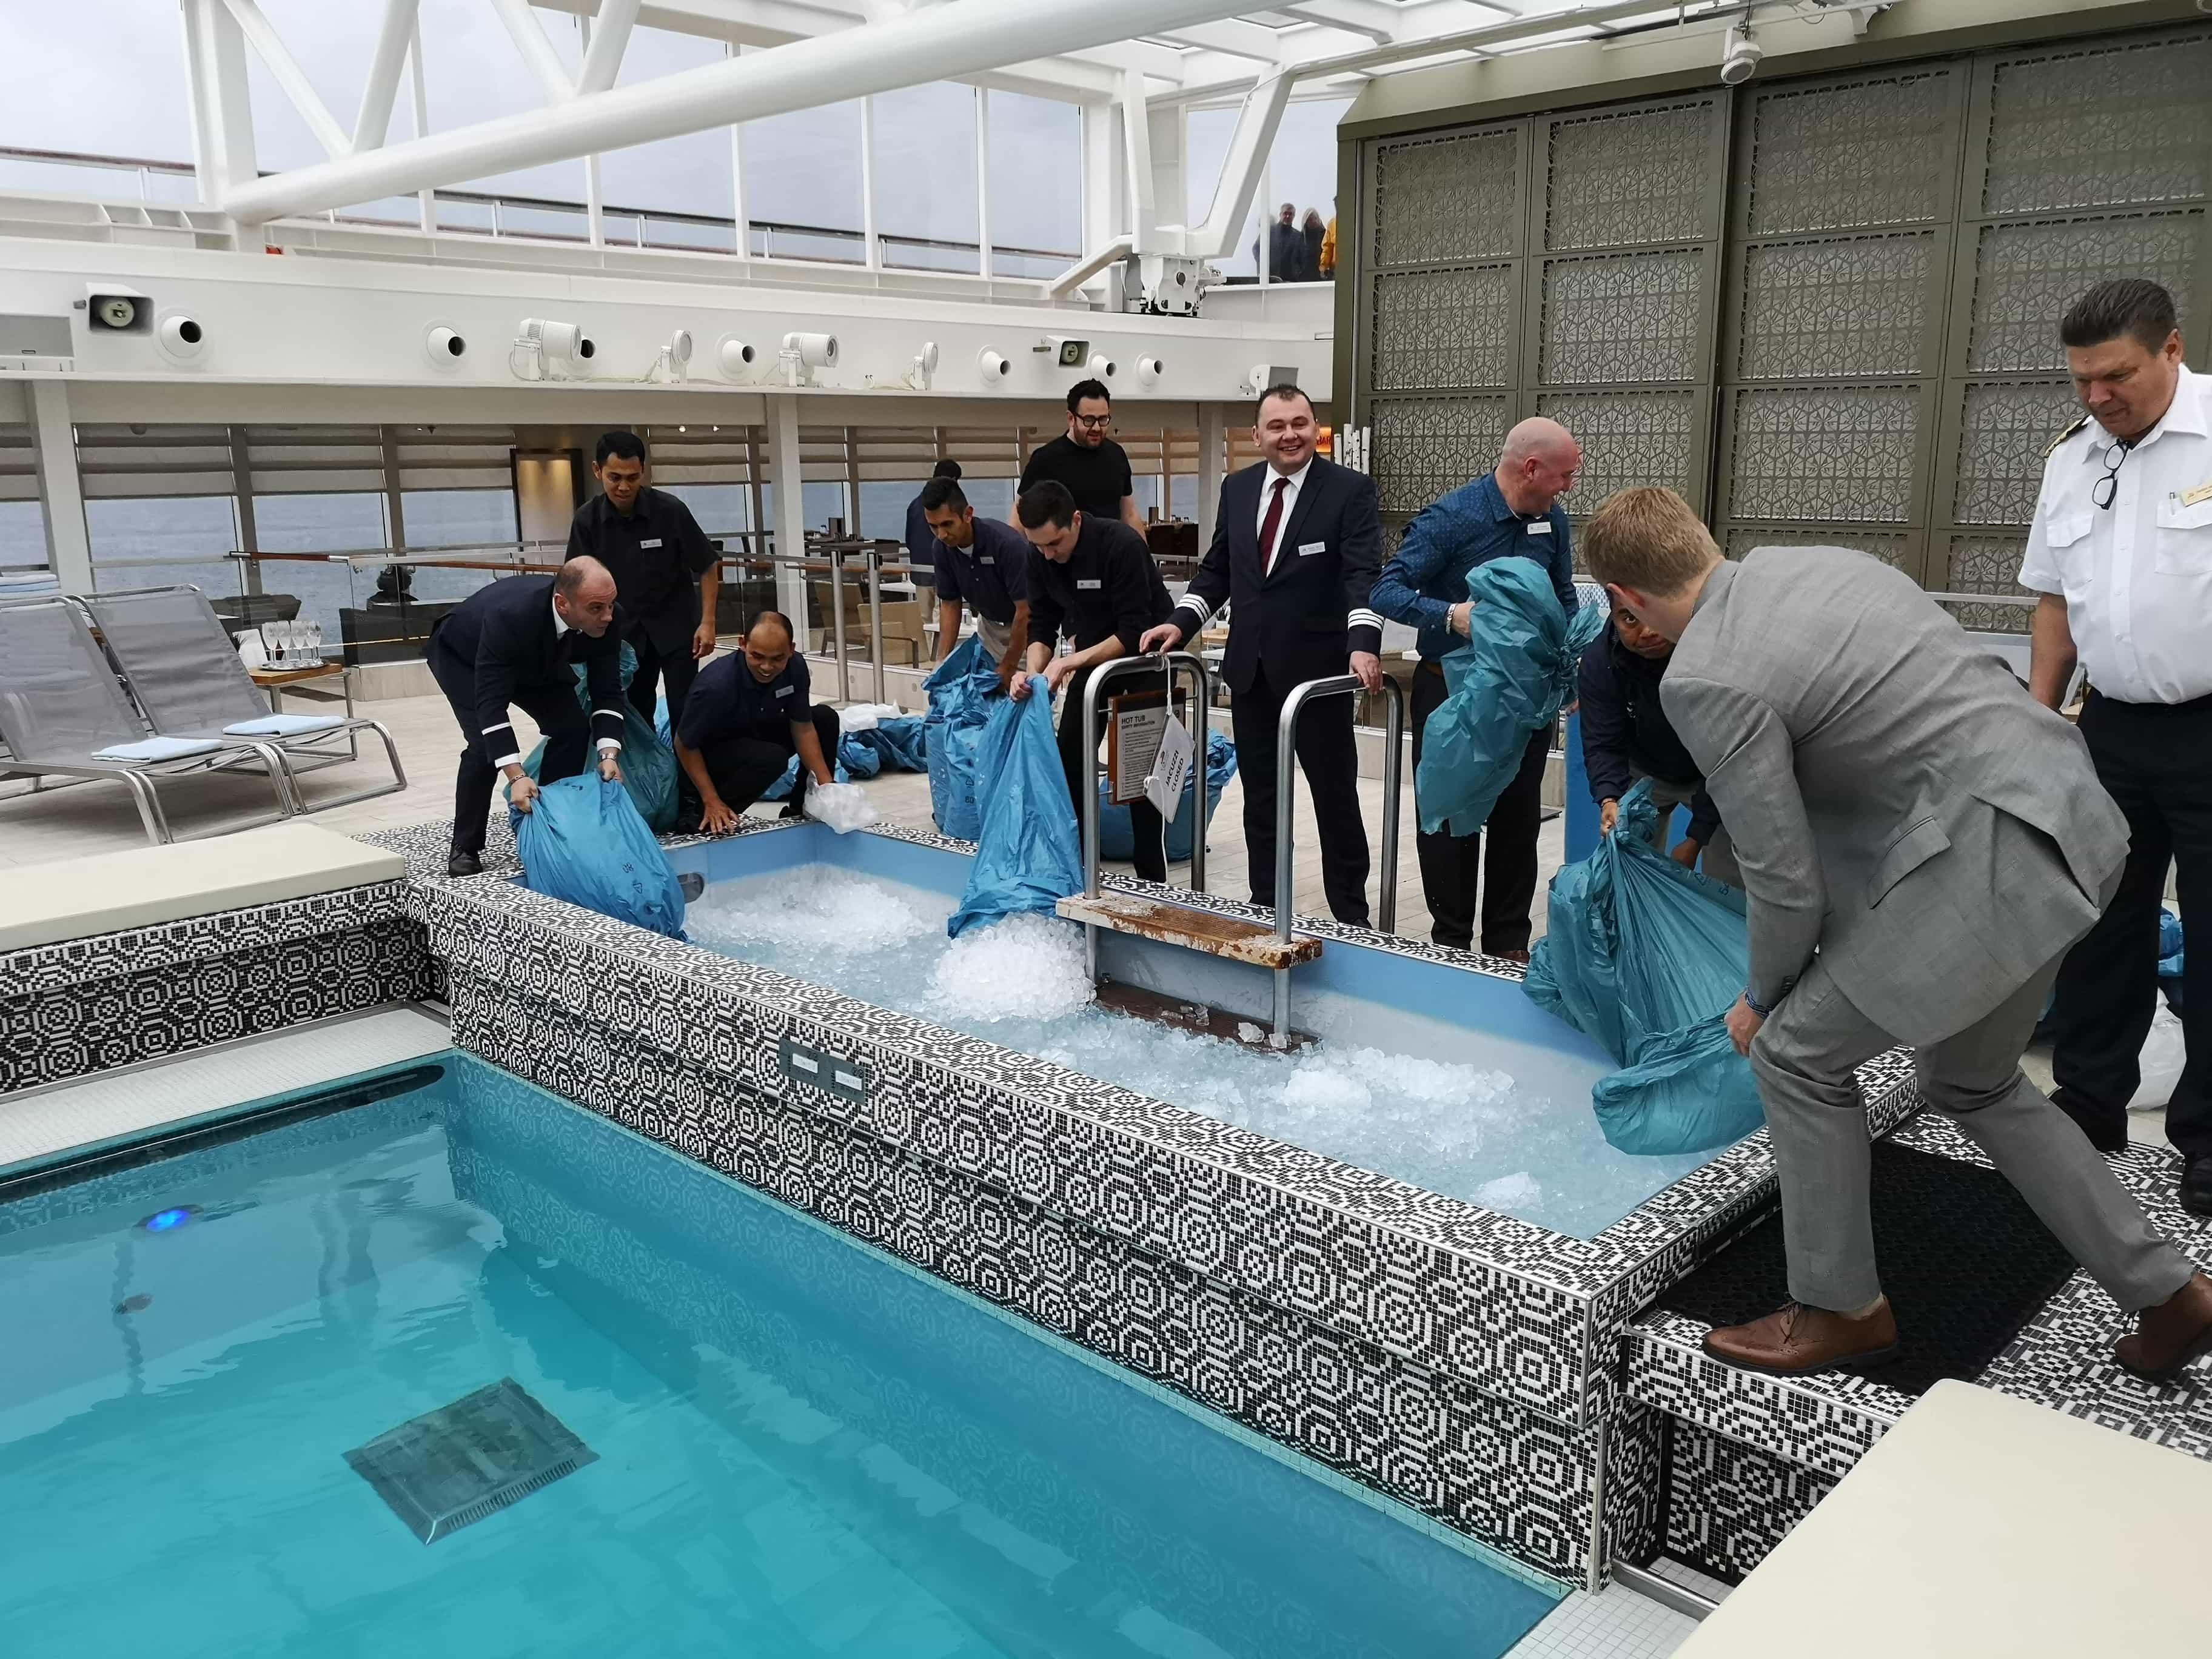 Viking Cruises Sea - Blue nose ceremony - Arctic circle - Ice in swimming pool